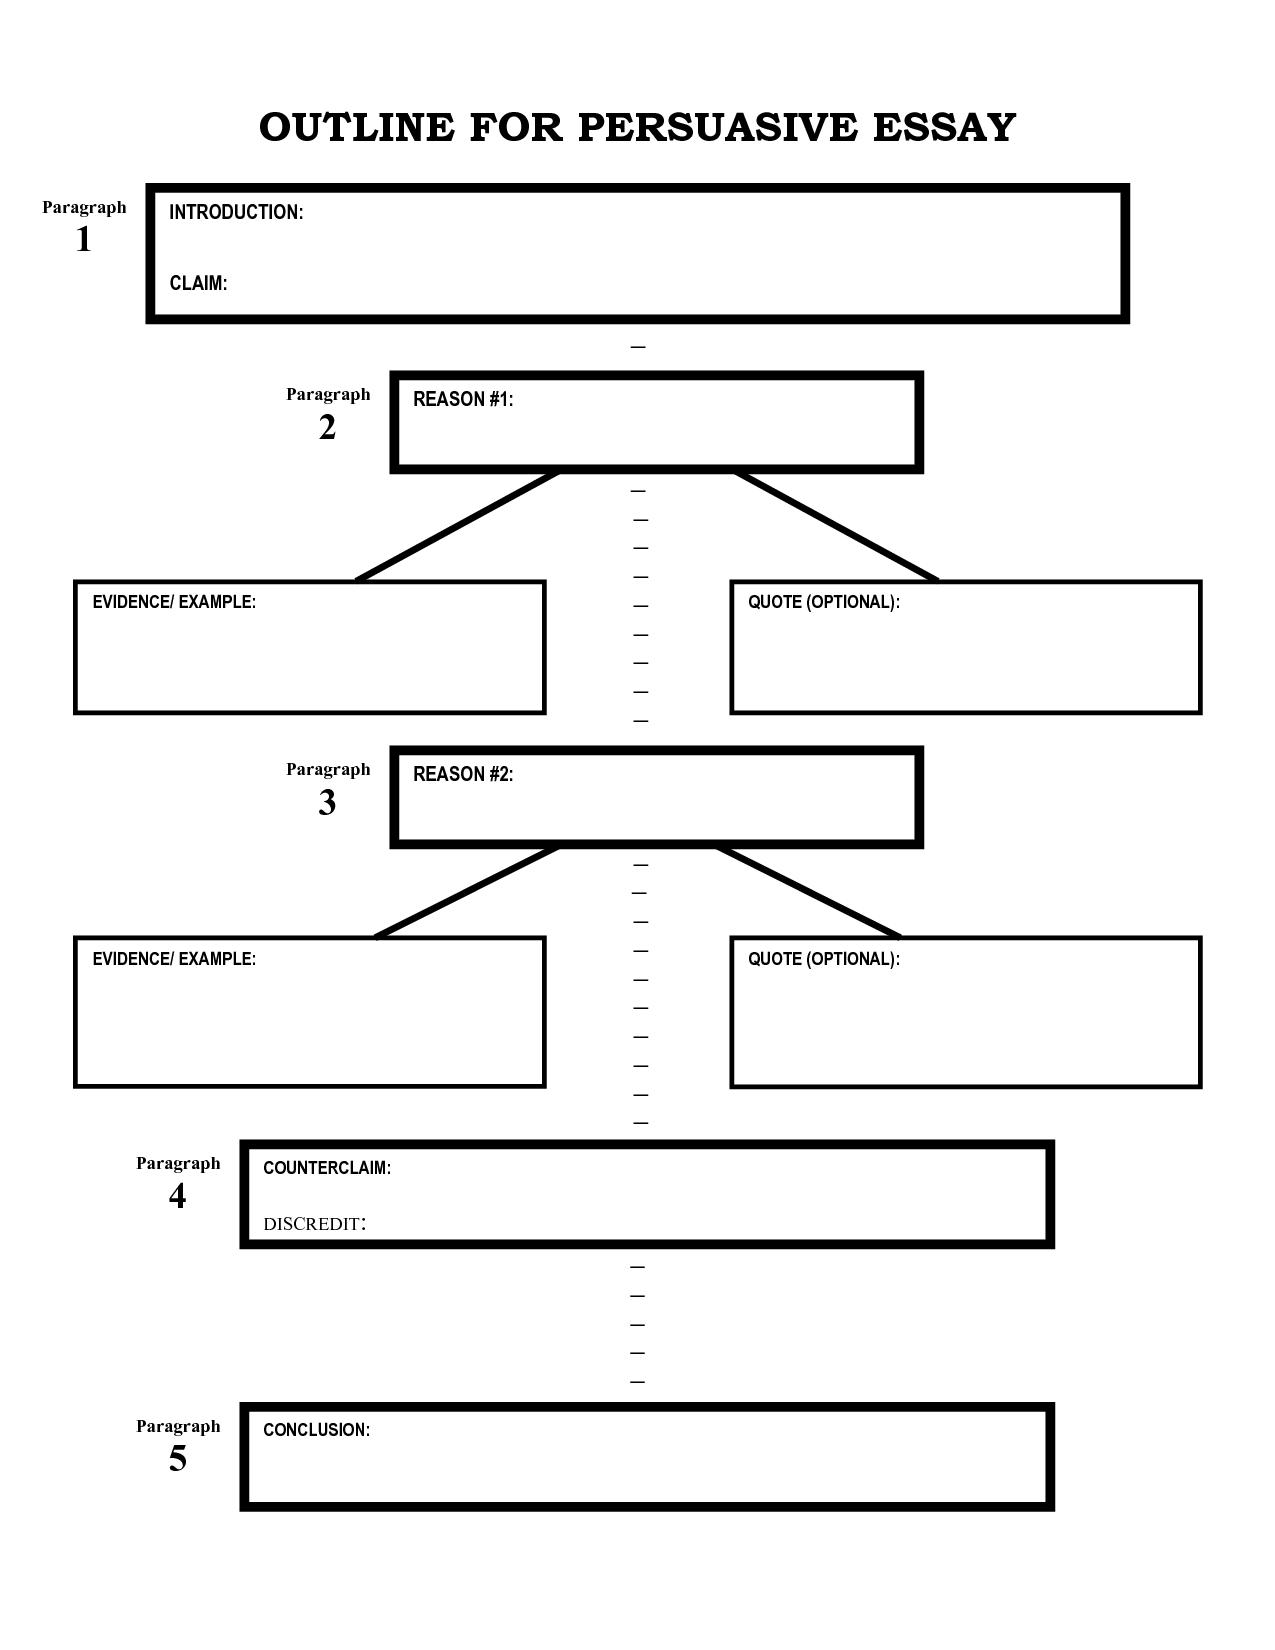 011 Outline For Persuasive Essay Stirring Argumentative Middle School Writing Full